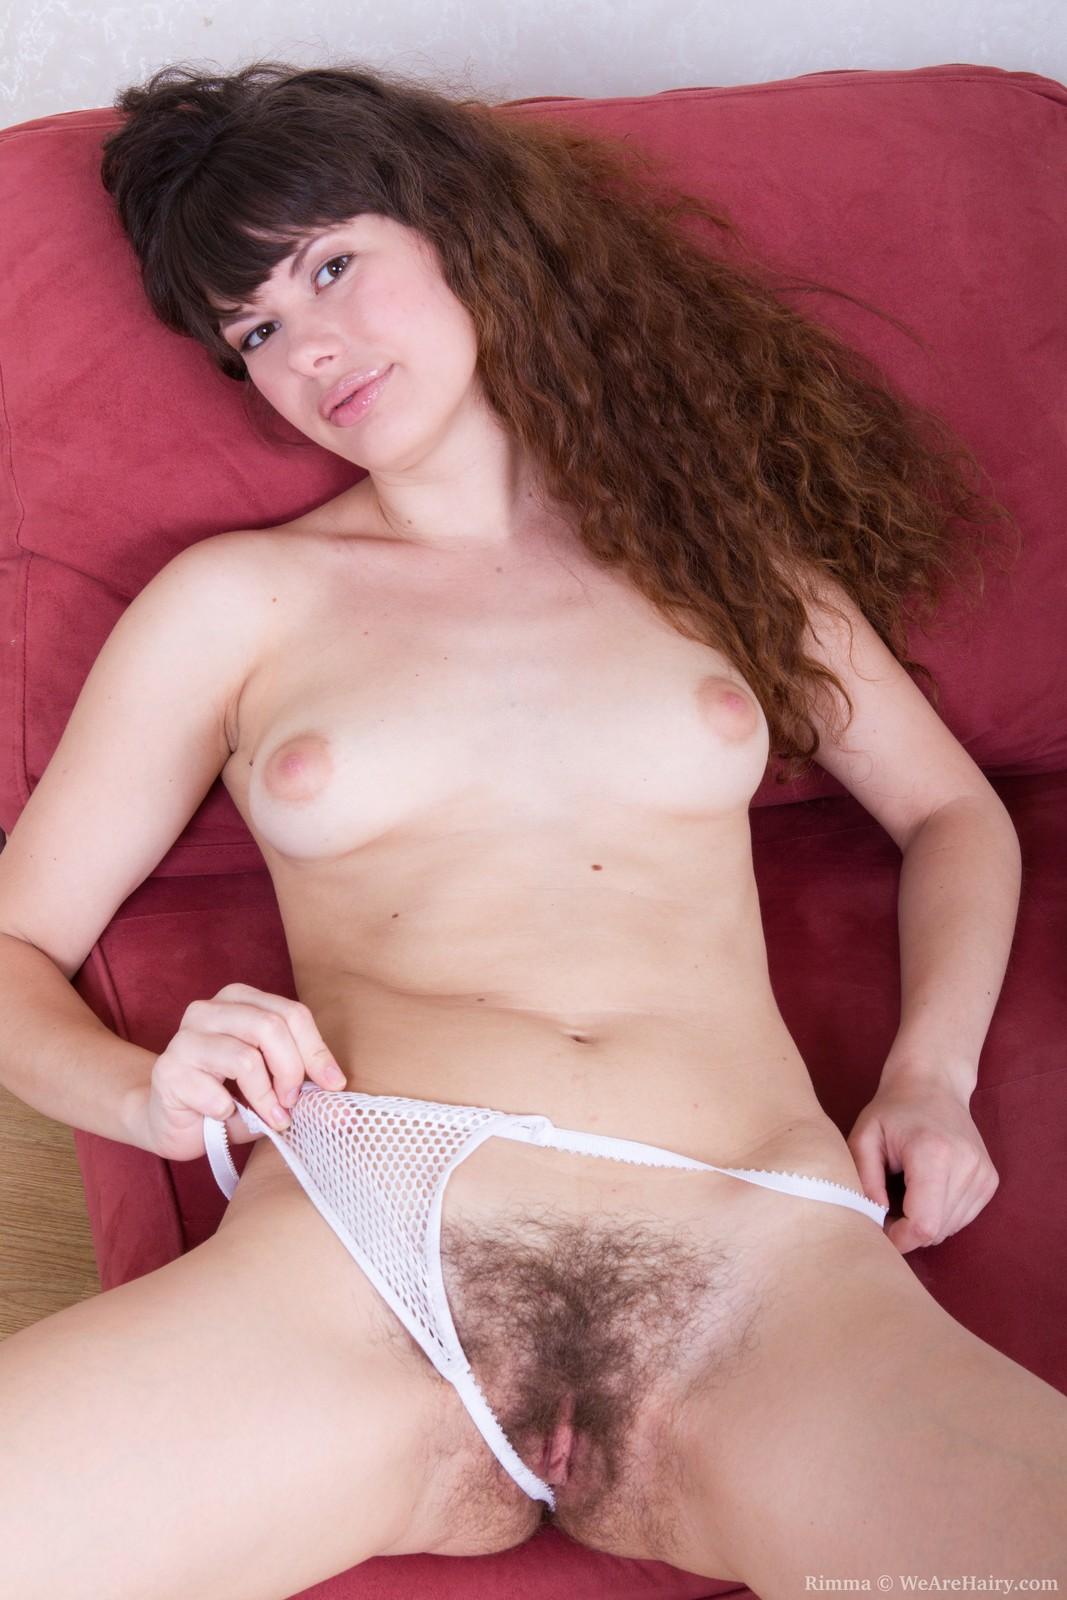 Penis injury from masturbation